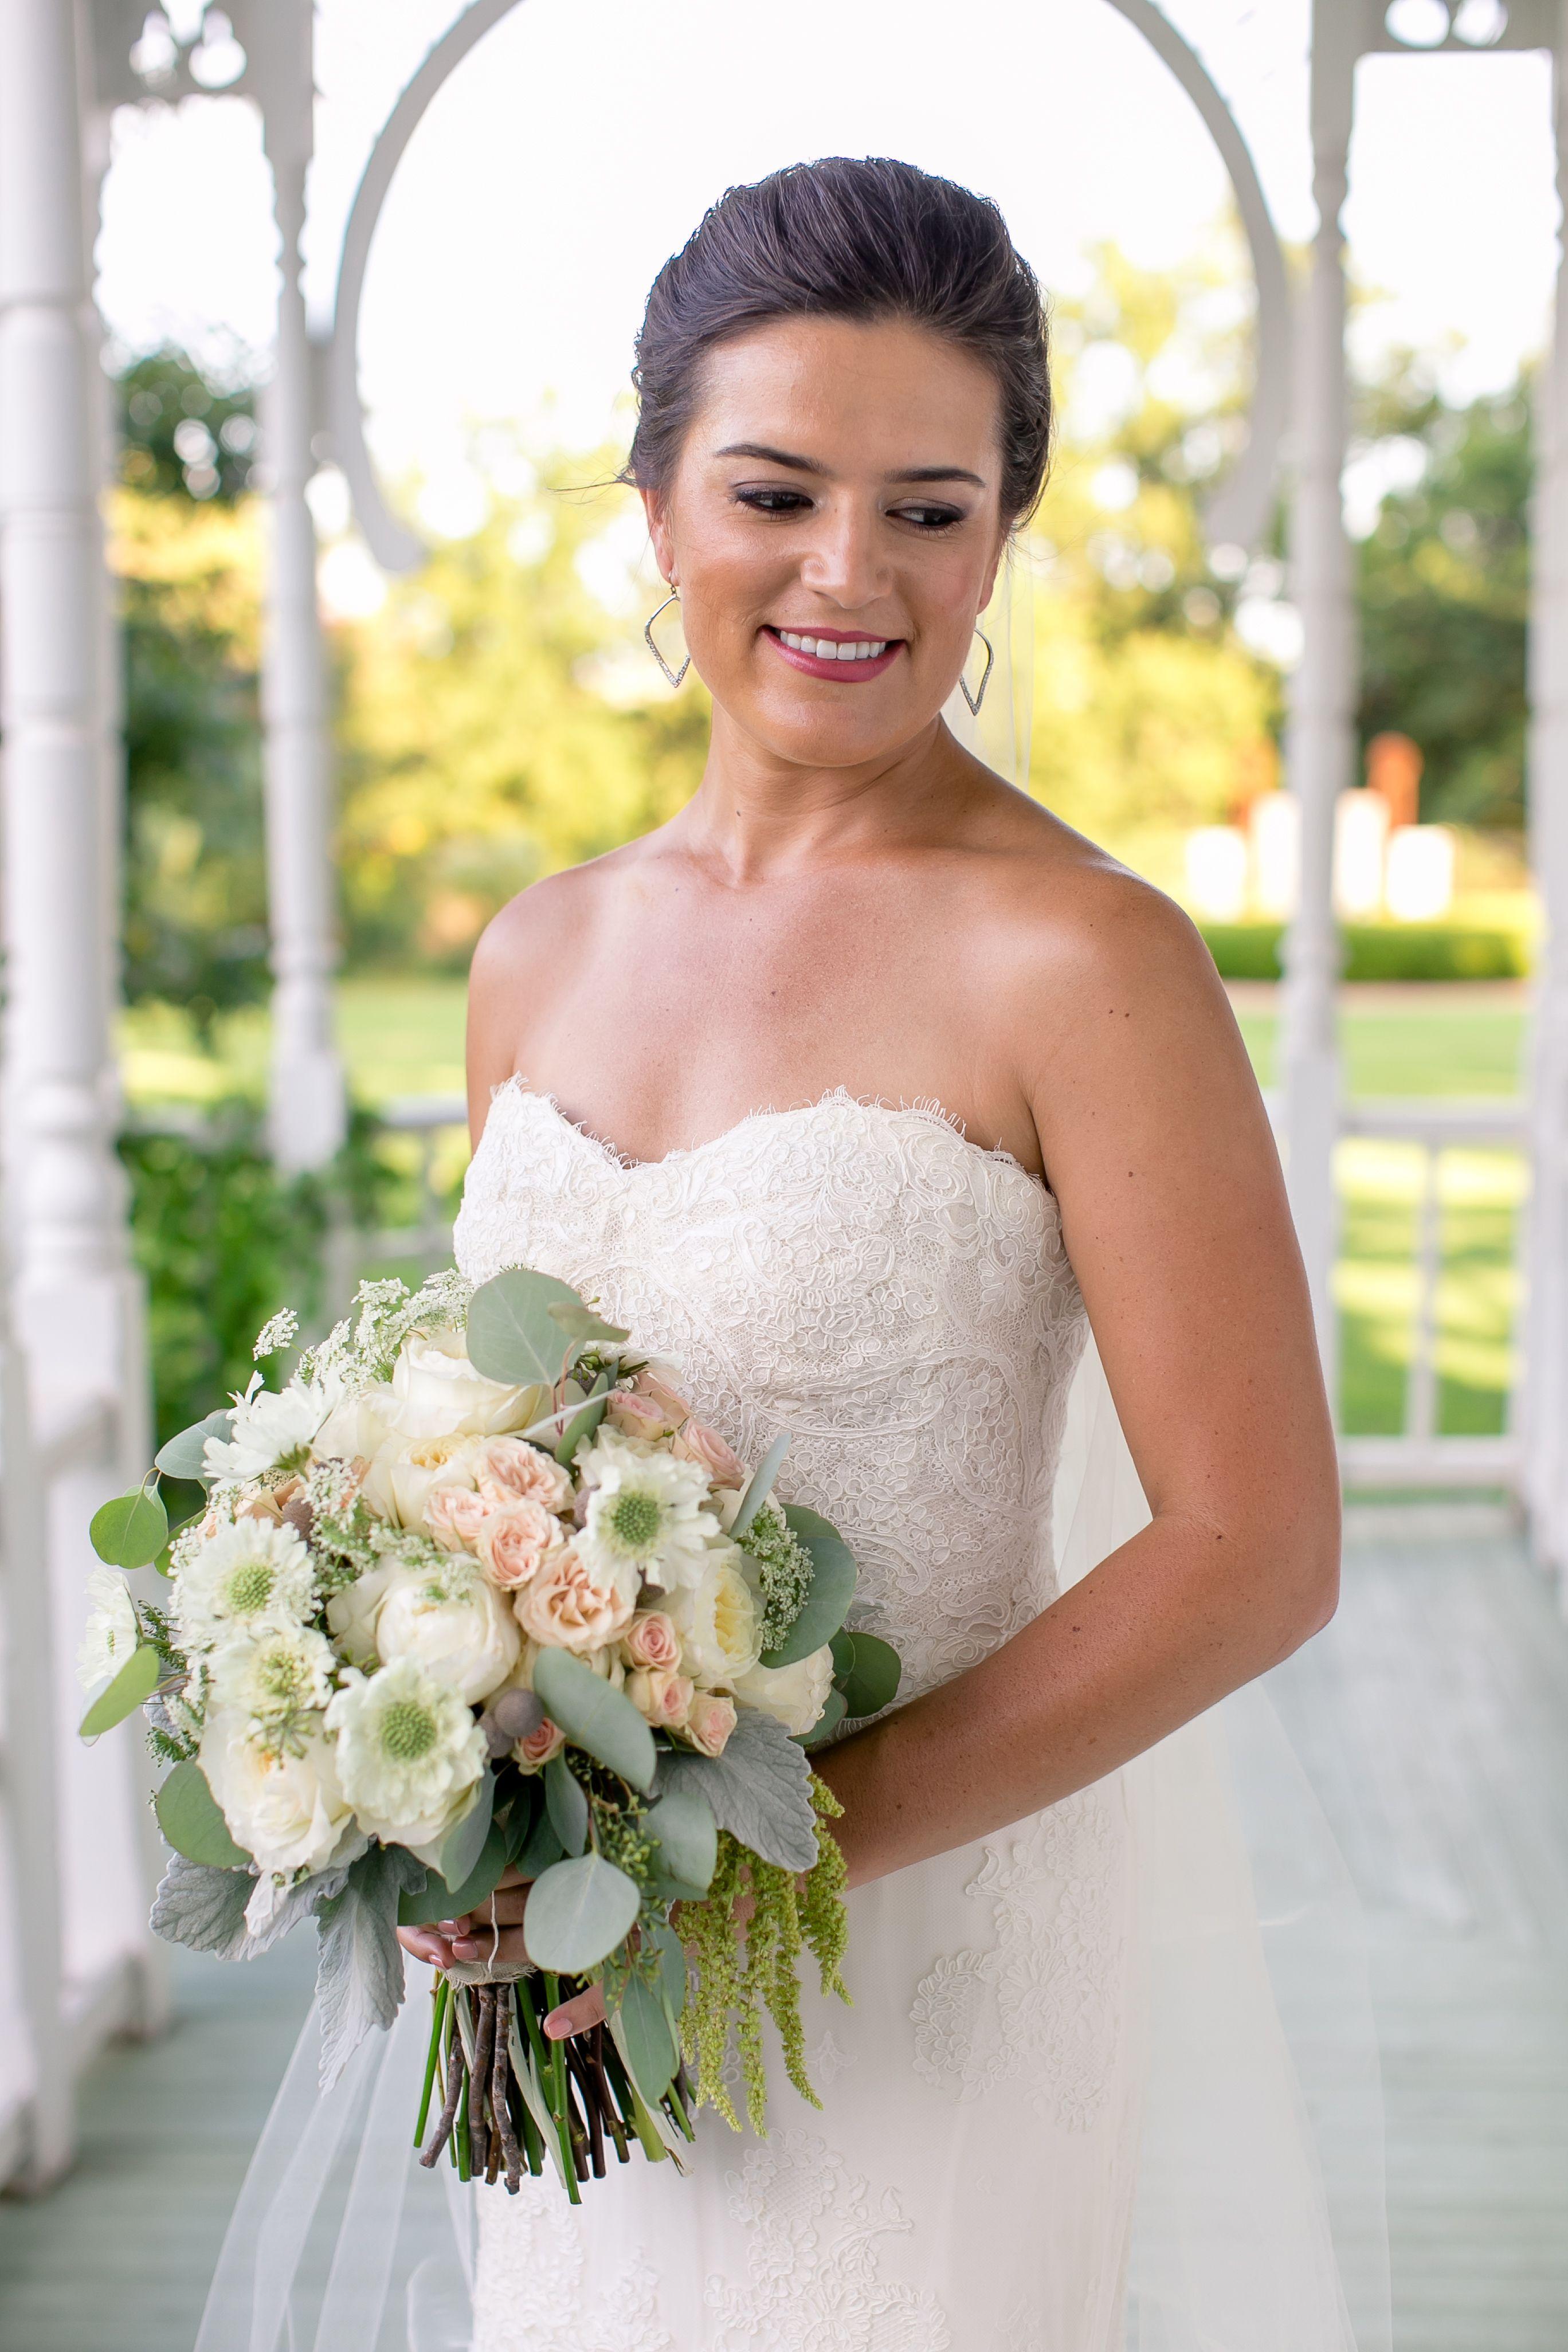 Carissa Will Carry A Naturally Shaped Bouquet Of White Mini Calla